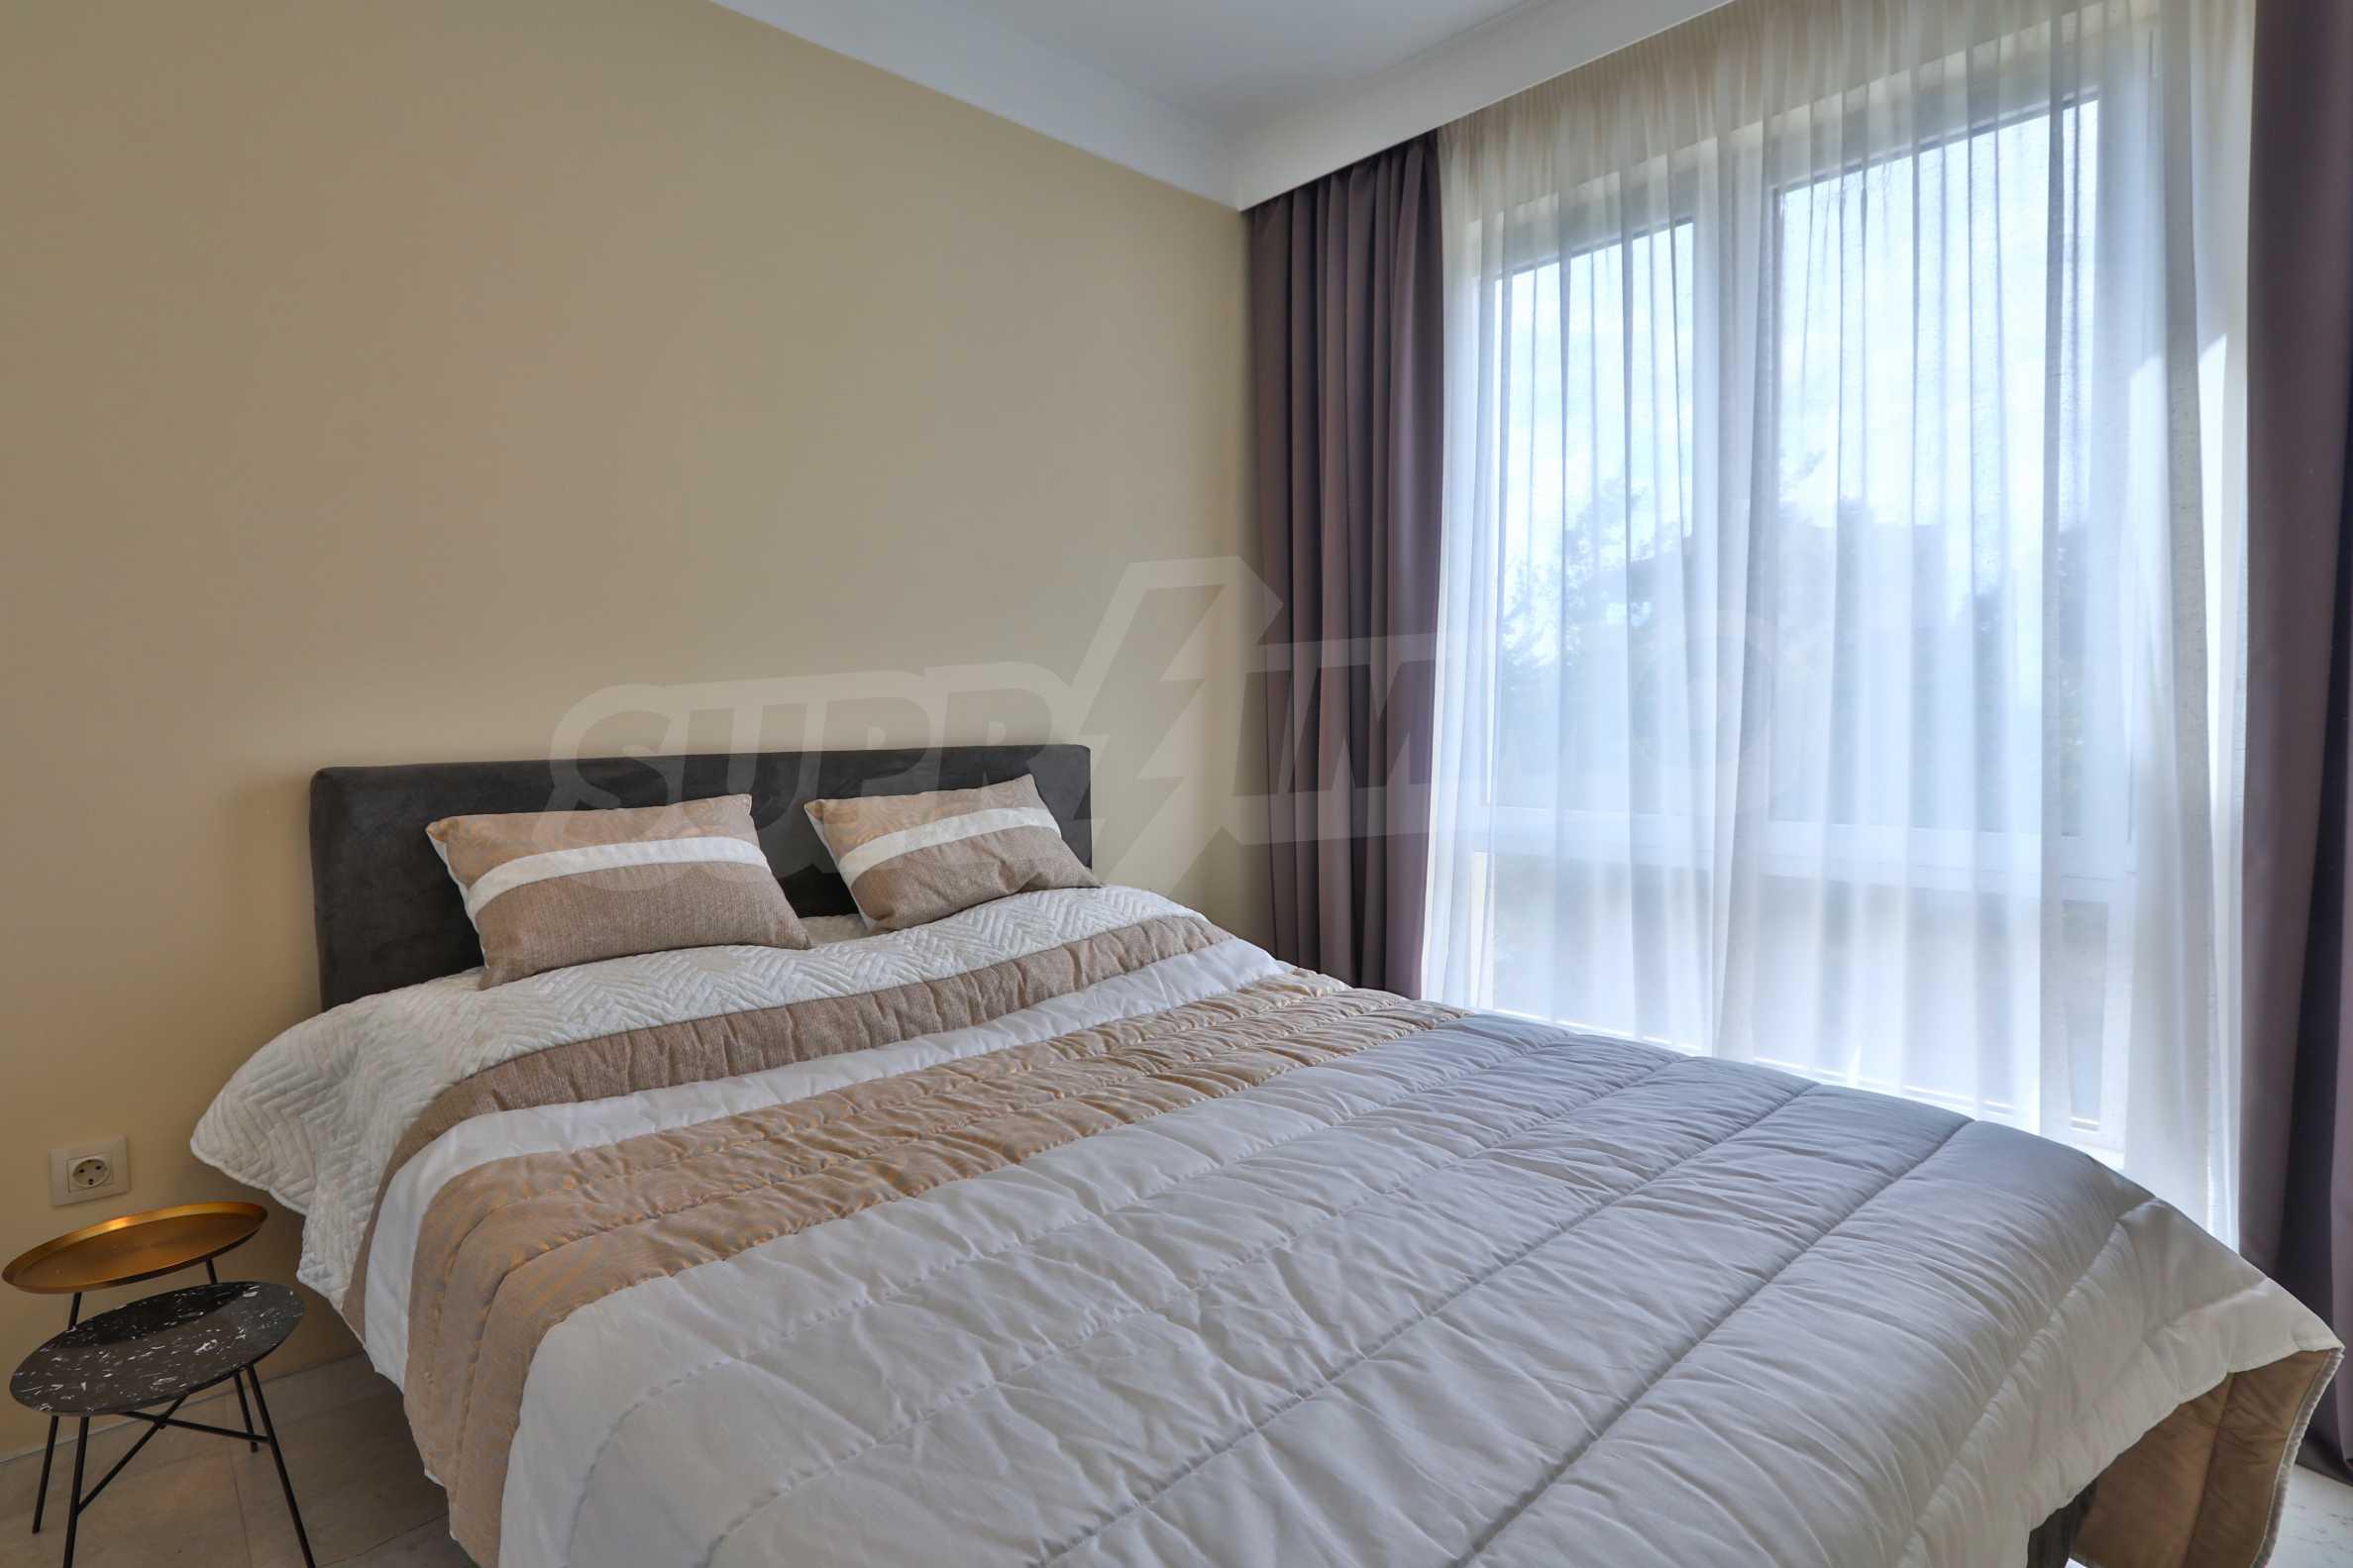 Exclusive 2-bedroom beachfront apartment in the prestigious Belle Époque Beach Residence 21